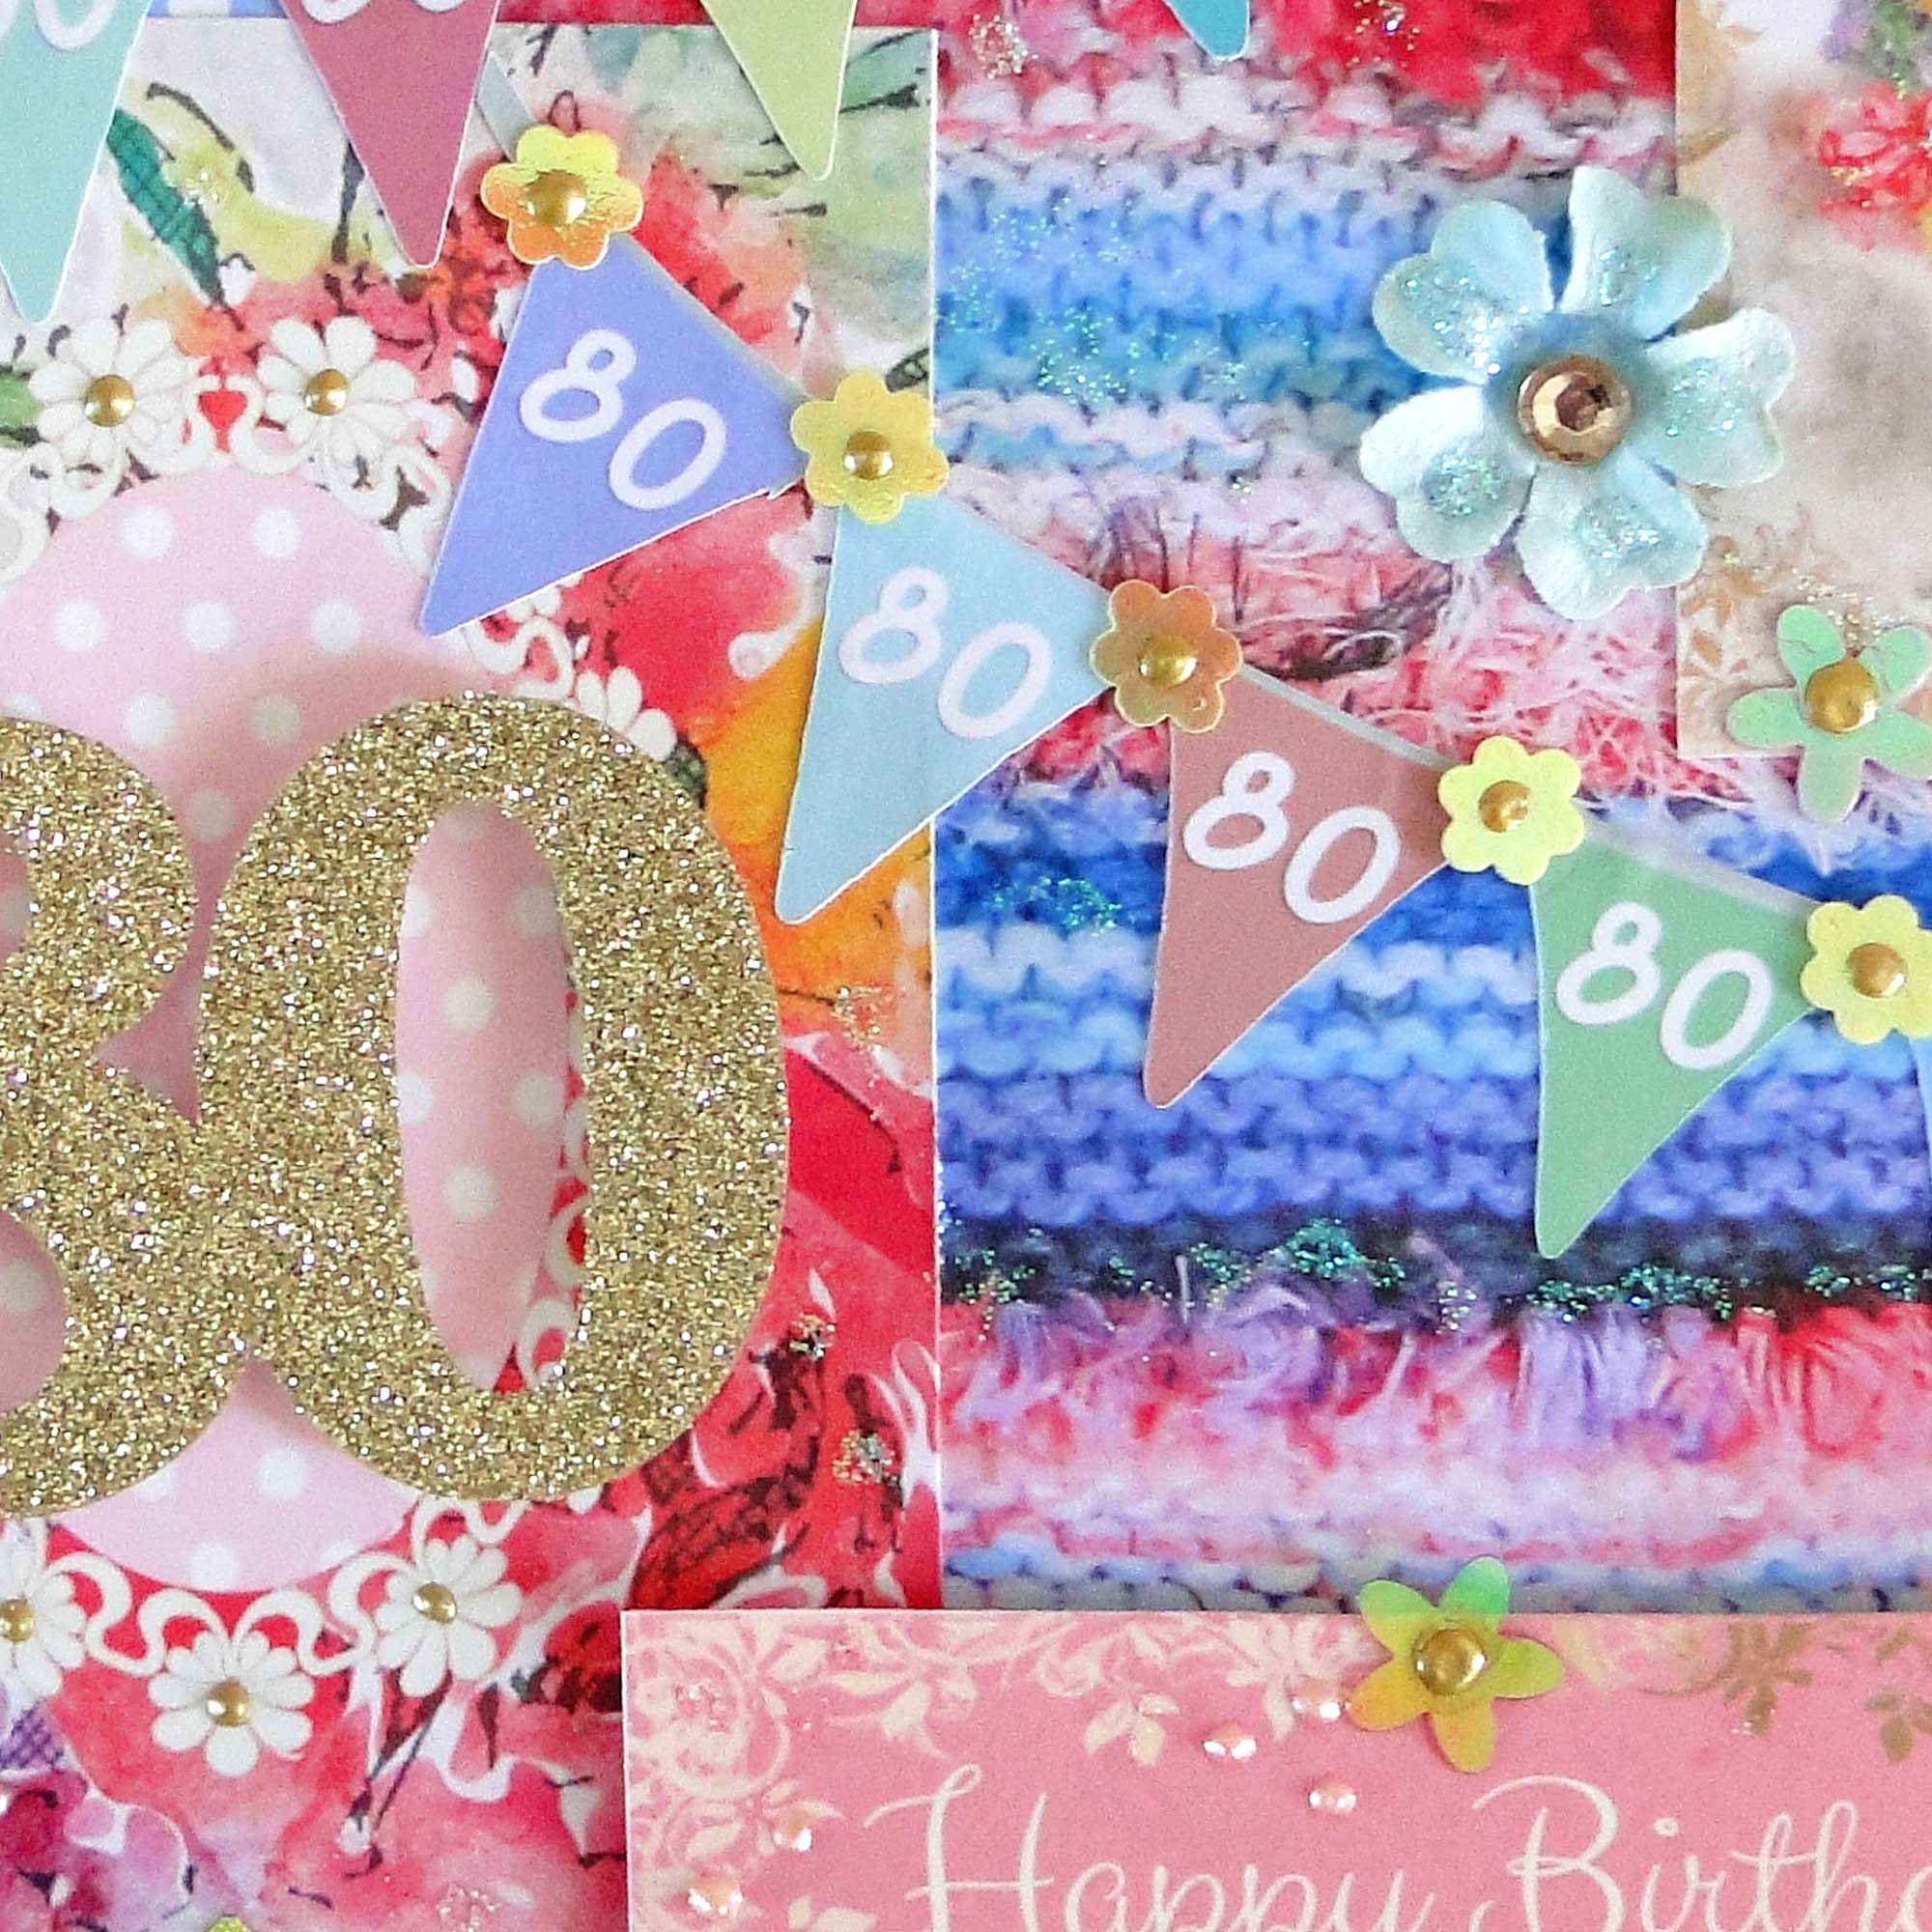 80th happy birthday card  pretty floral design  paradis